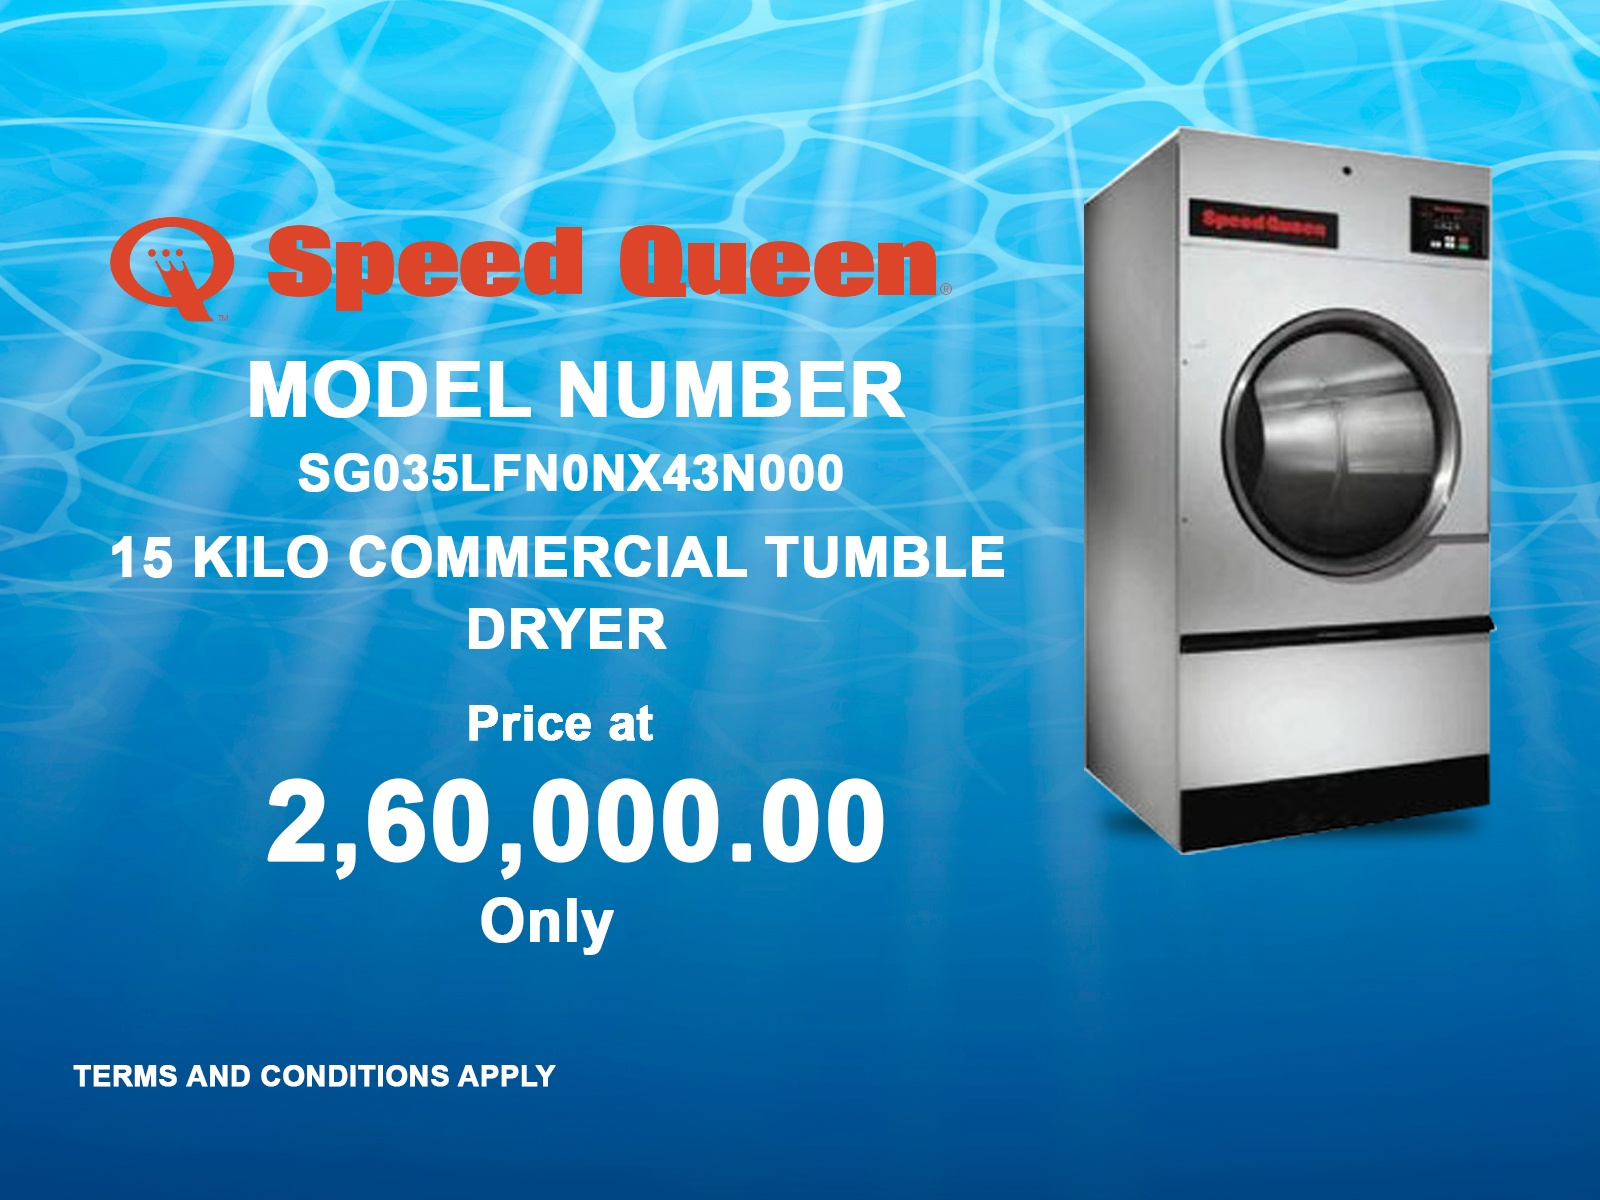 15 Kilo Commercial Tumble Dryer